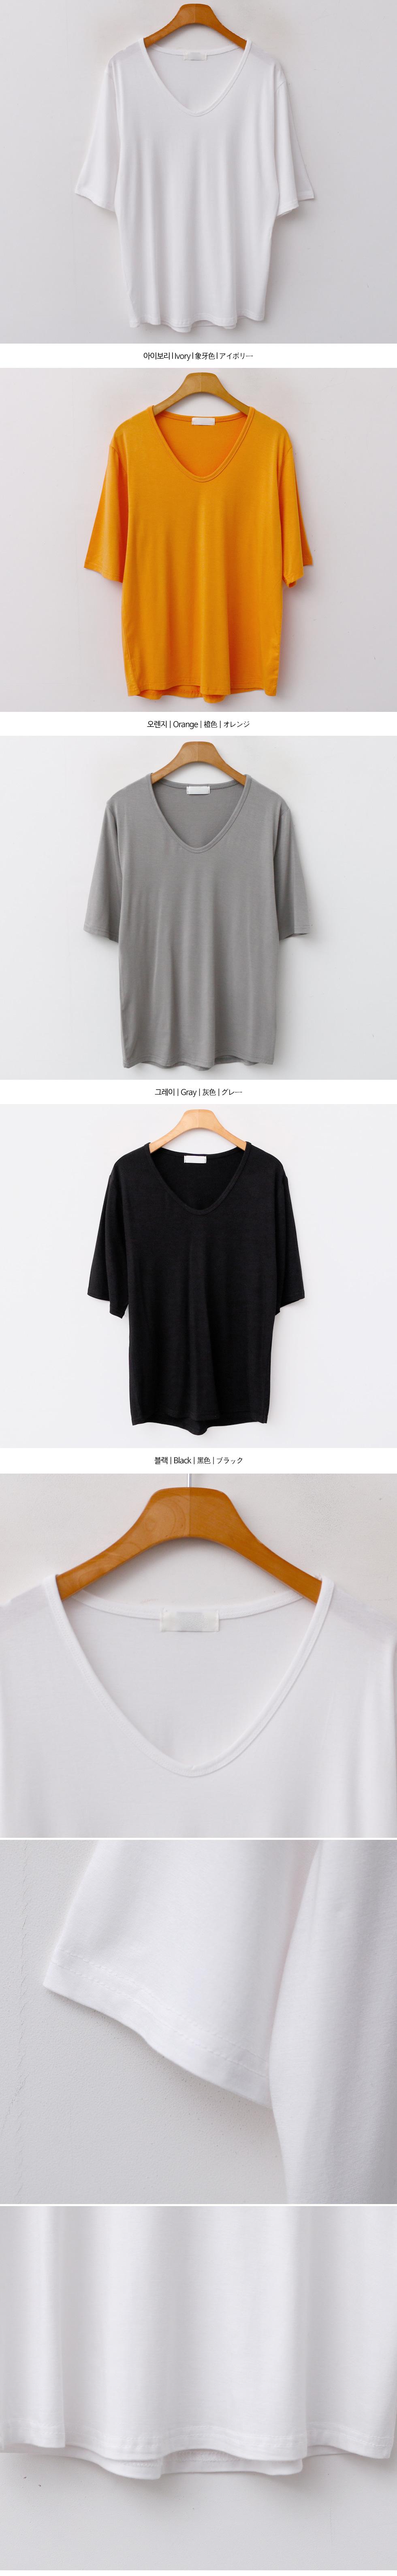 Simplay On T-shirt